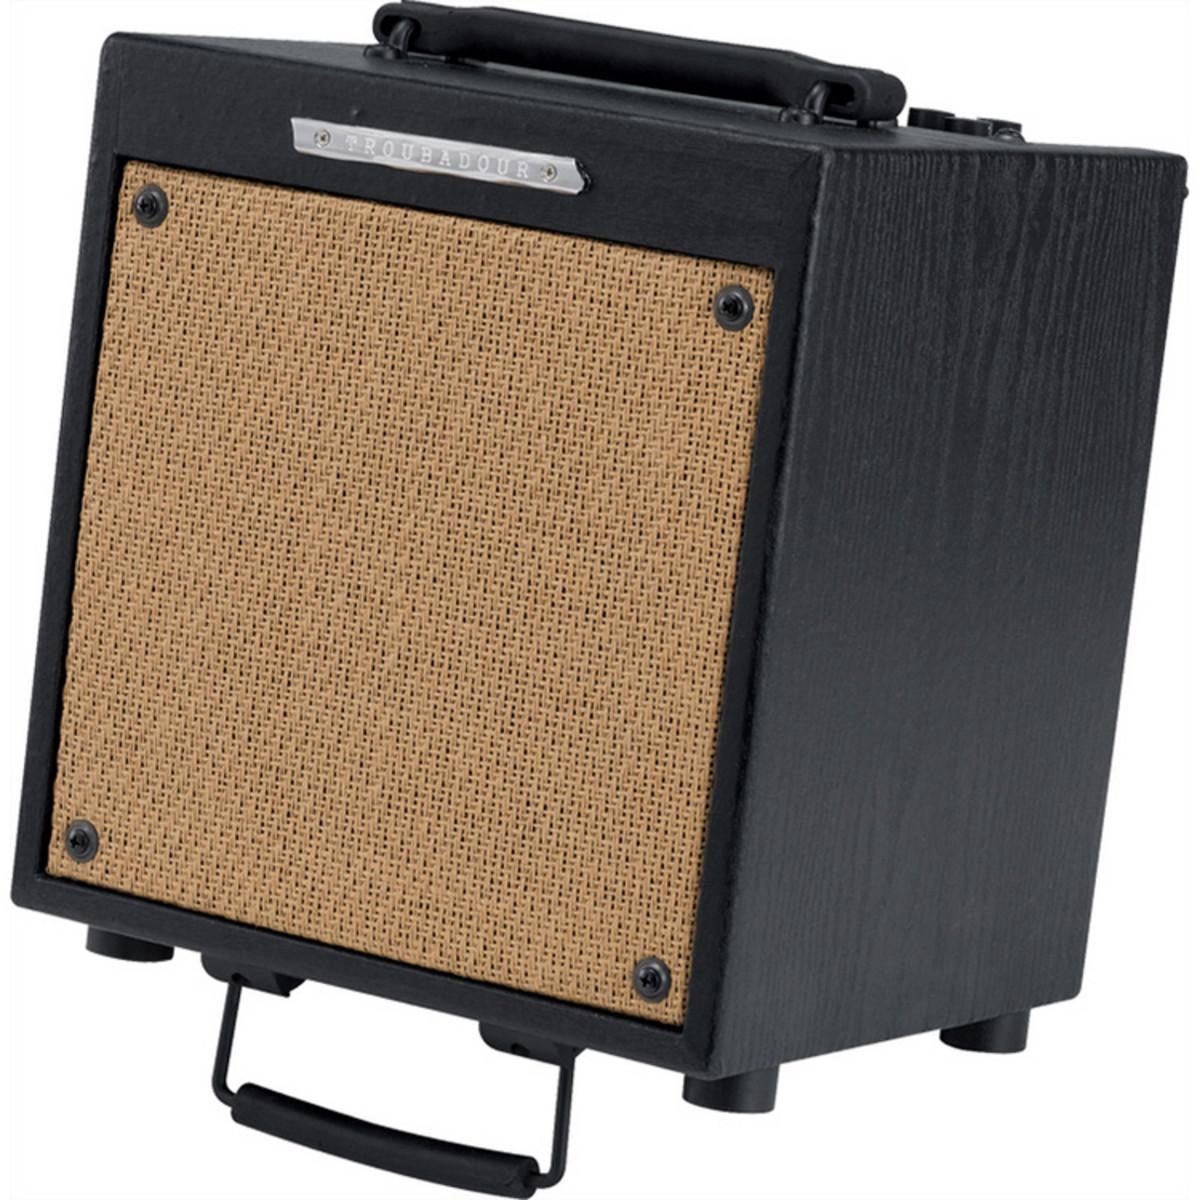 disc ibanez troubadour t20 acoustic amplifier at. Black Bedroom Furniture Sets. Home Design Ideas